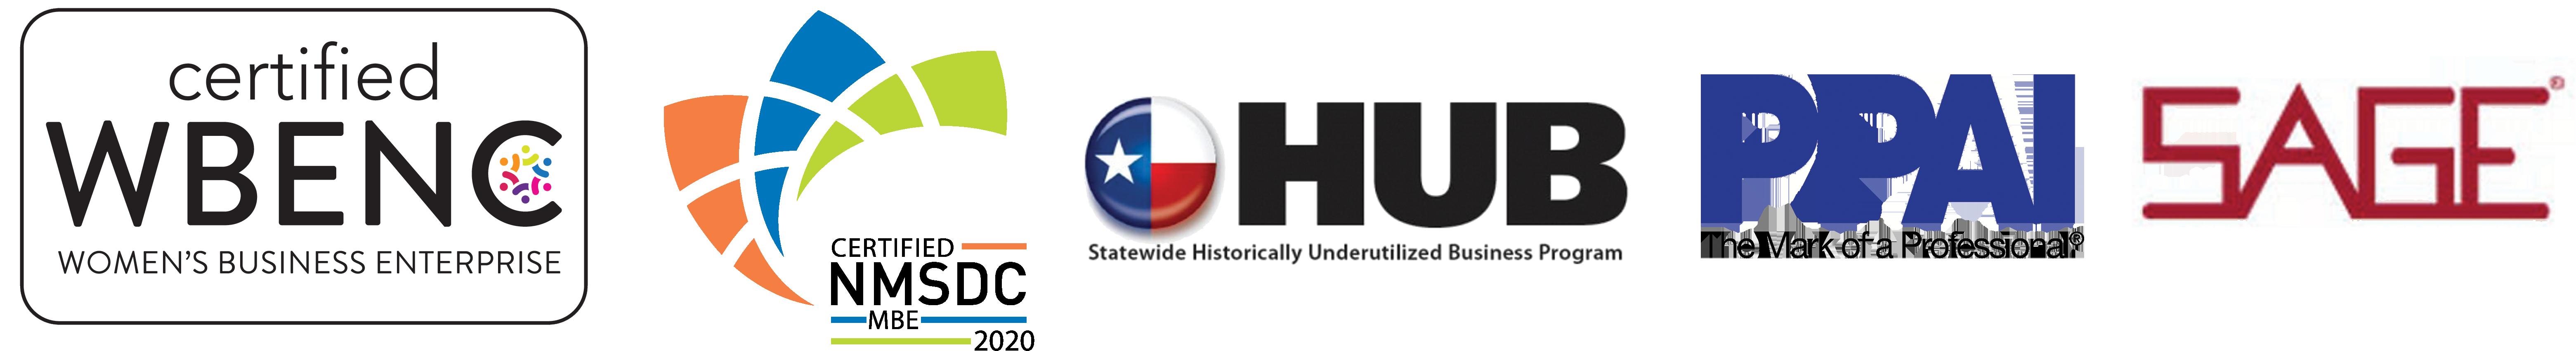 women own certified logo, nmsdc logo, HUB logo